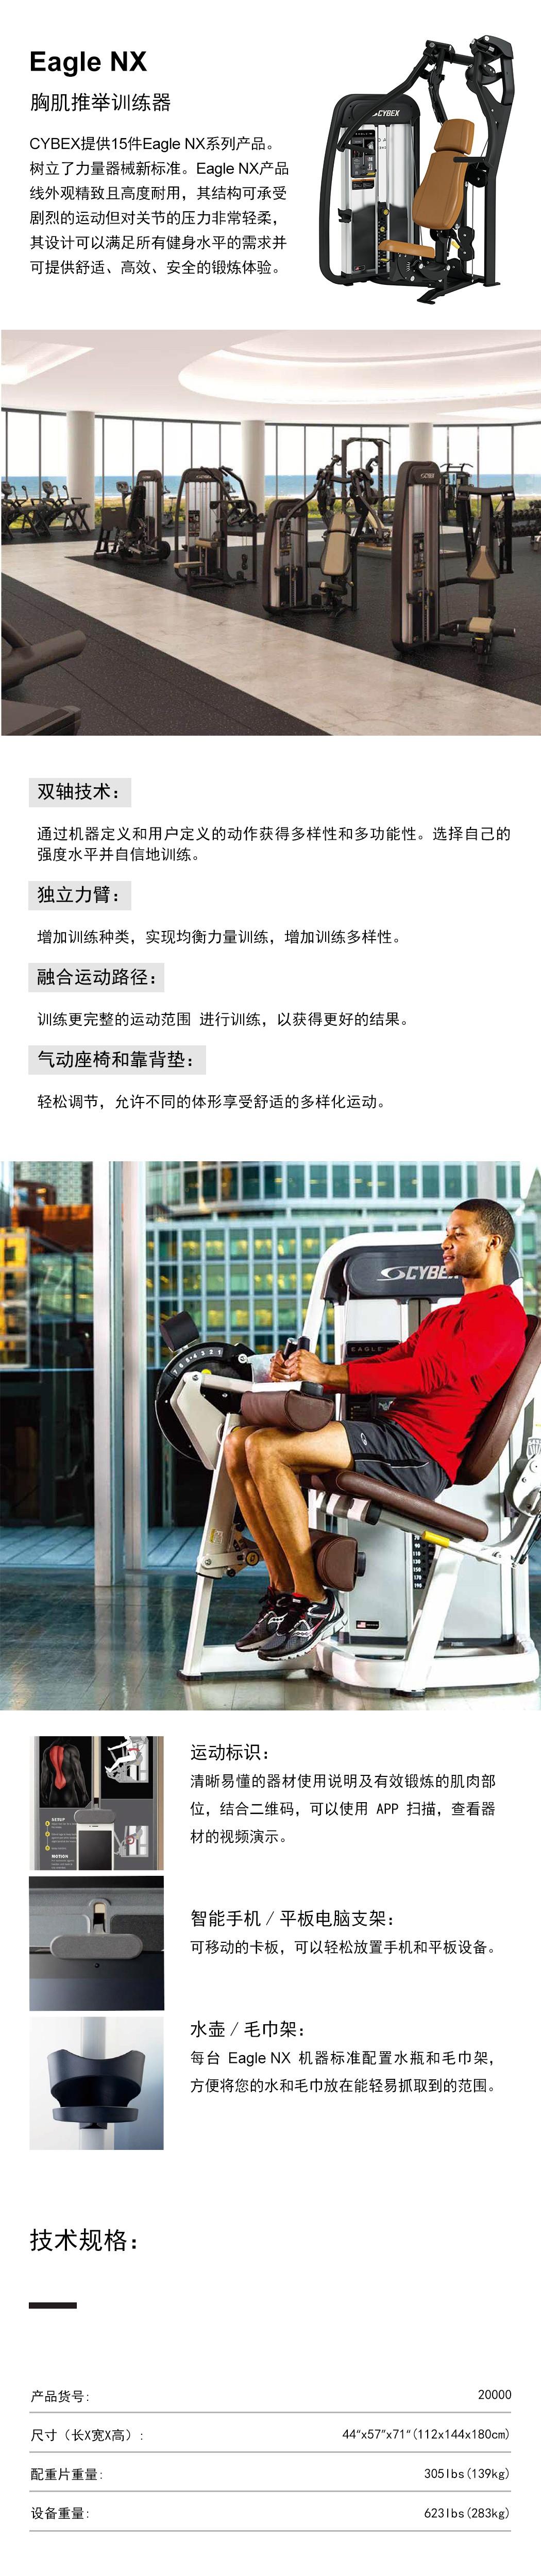 cybex-胸肌推举训练器.jpg